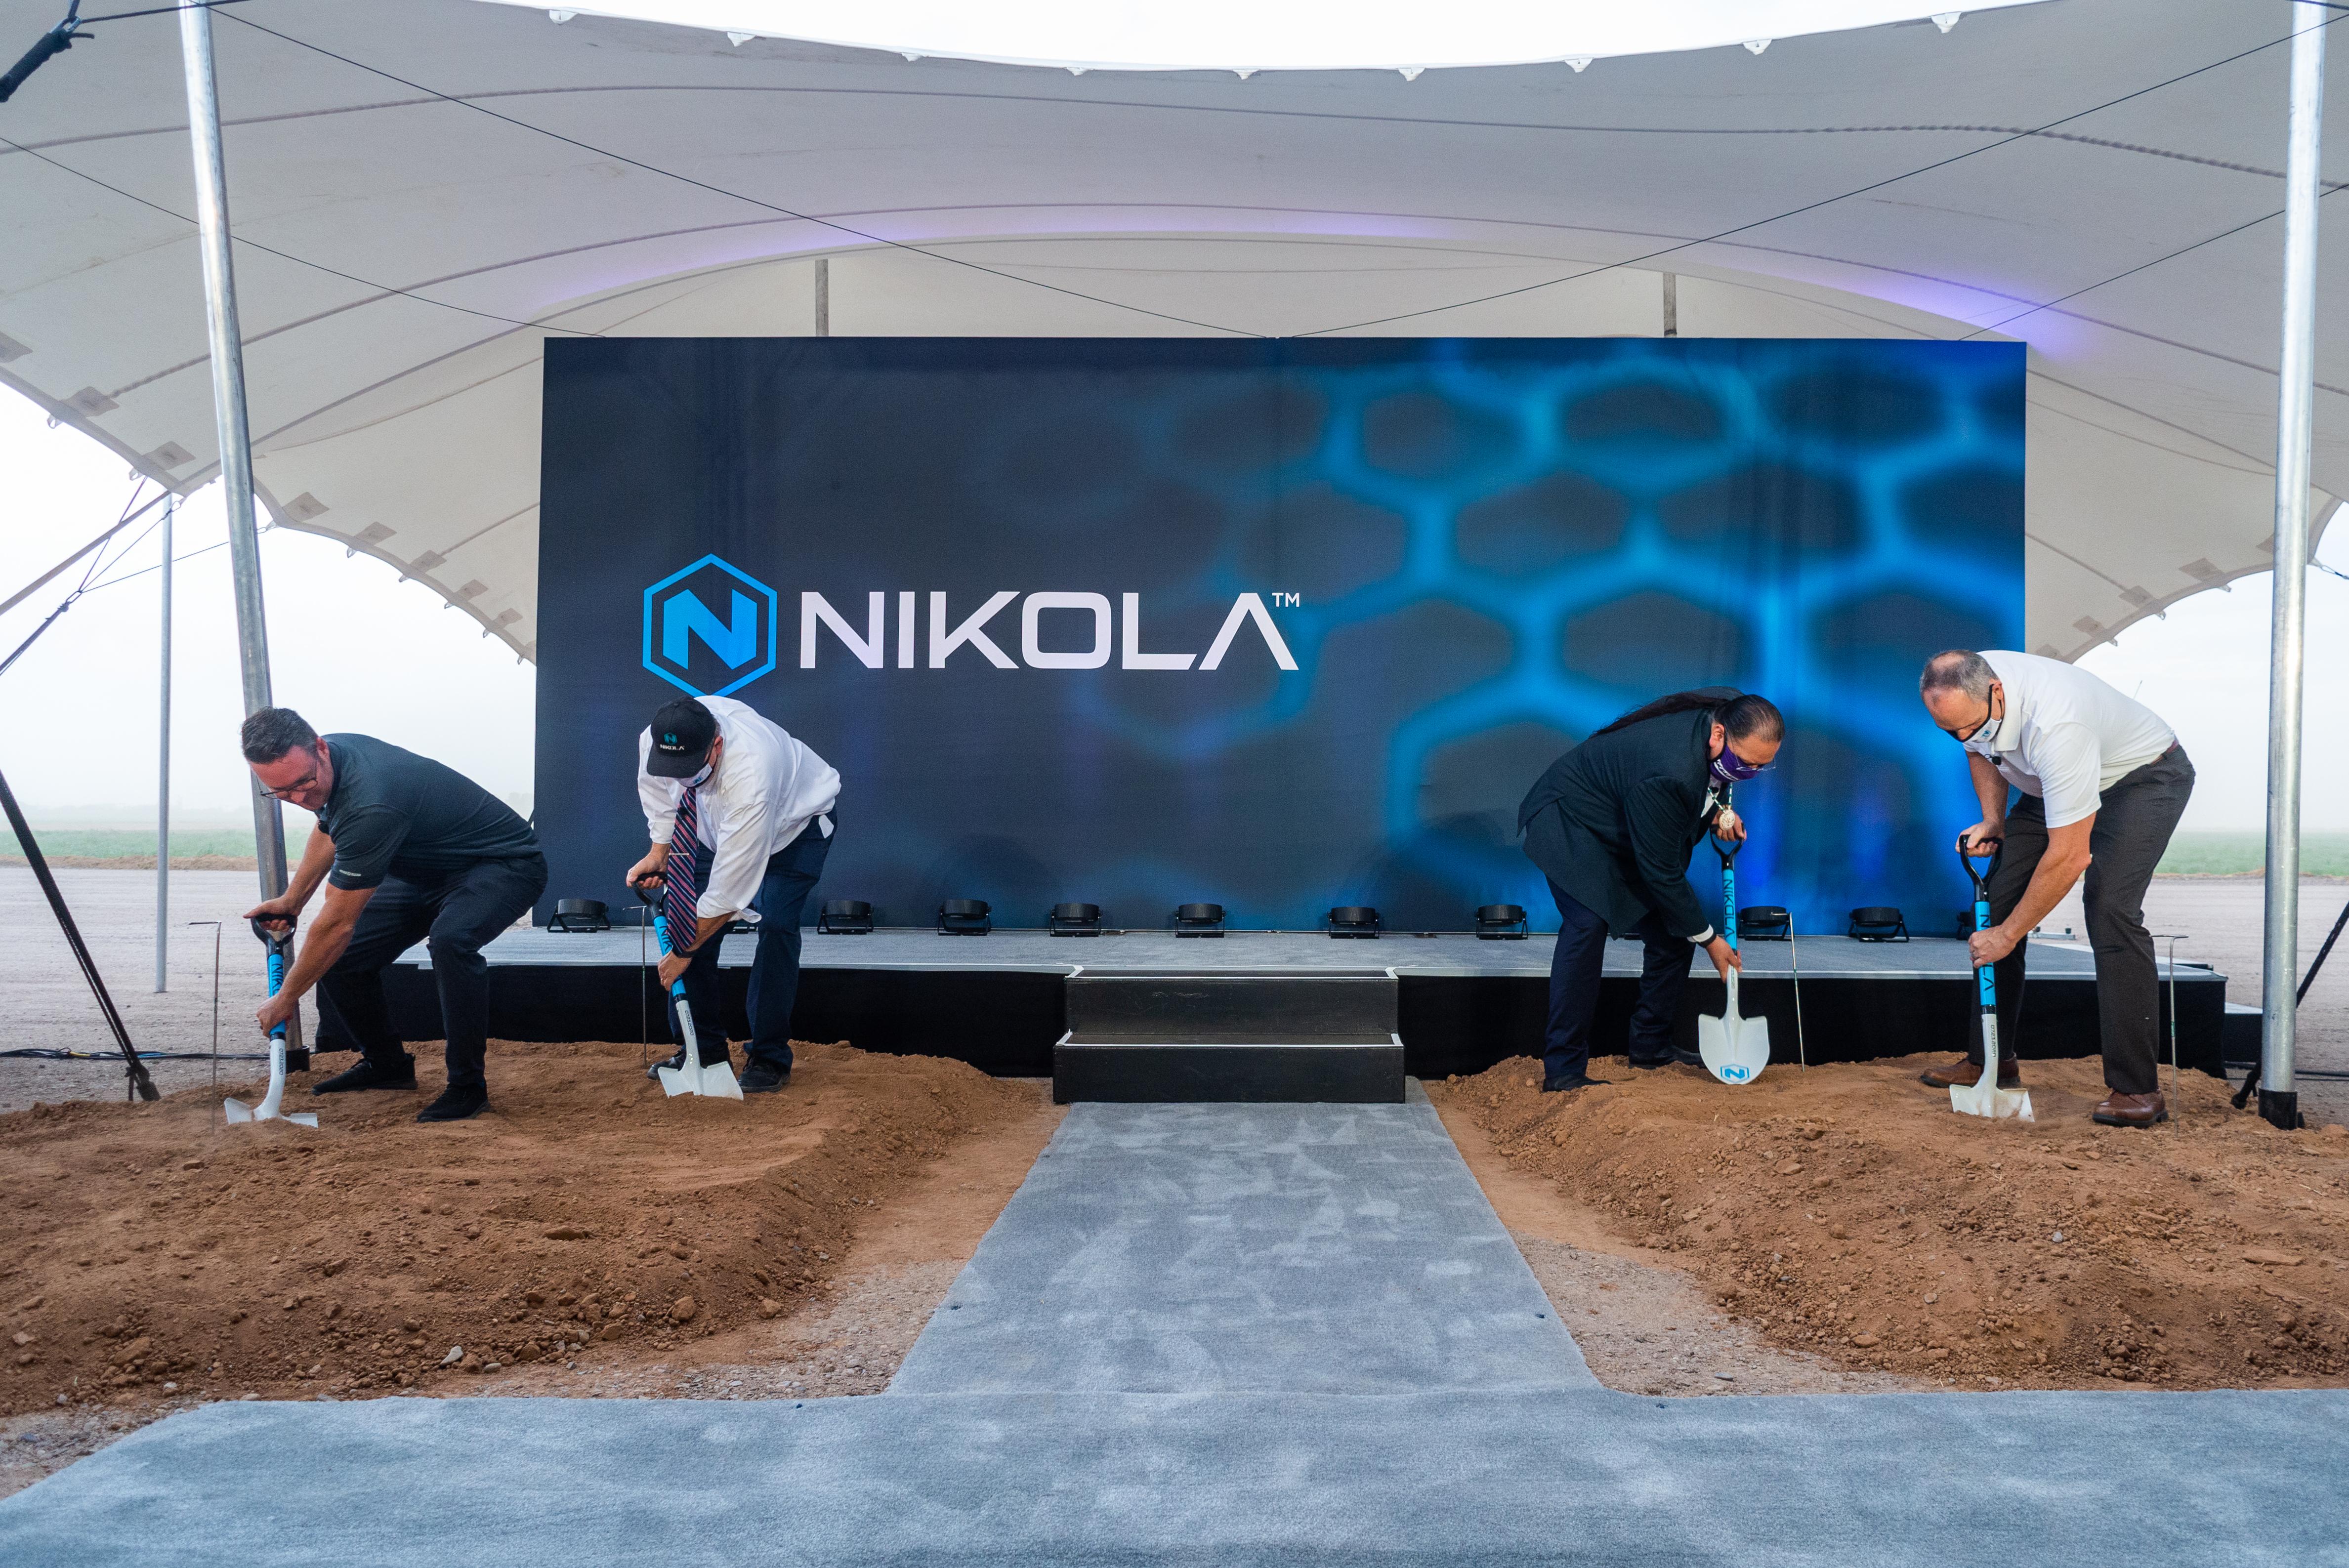 Nikola ground breaking event press release 25